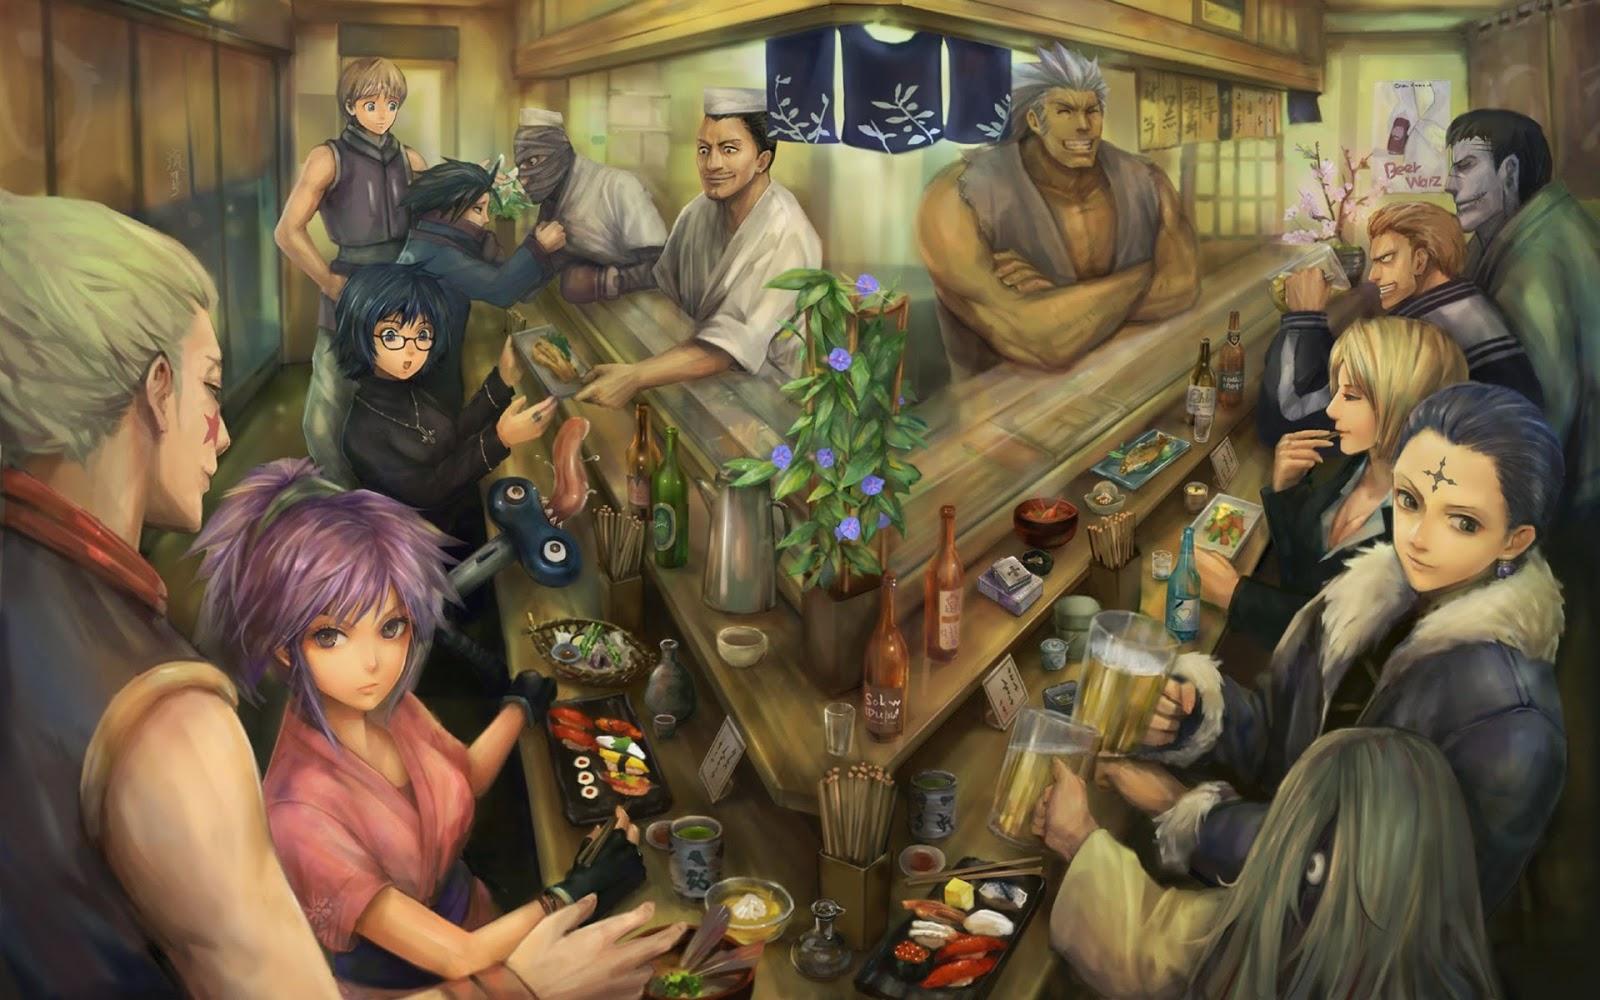 Hunter X Hunter Wallpaper HD Otaku | Otaku brings us together